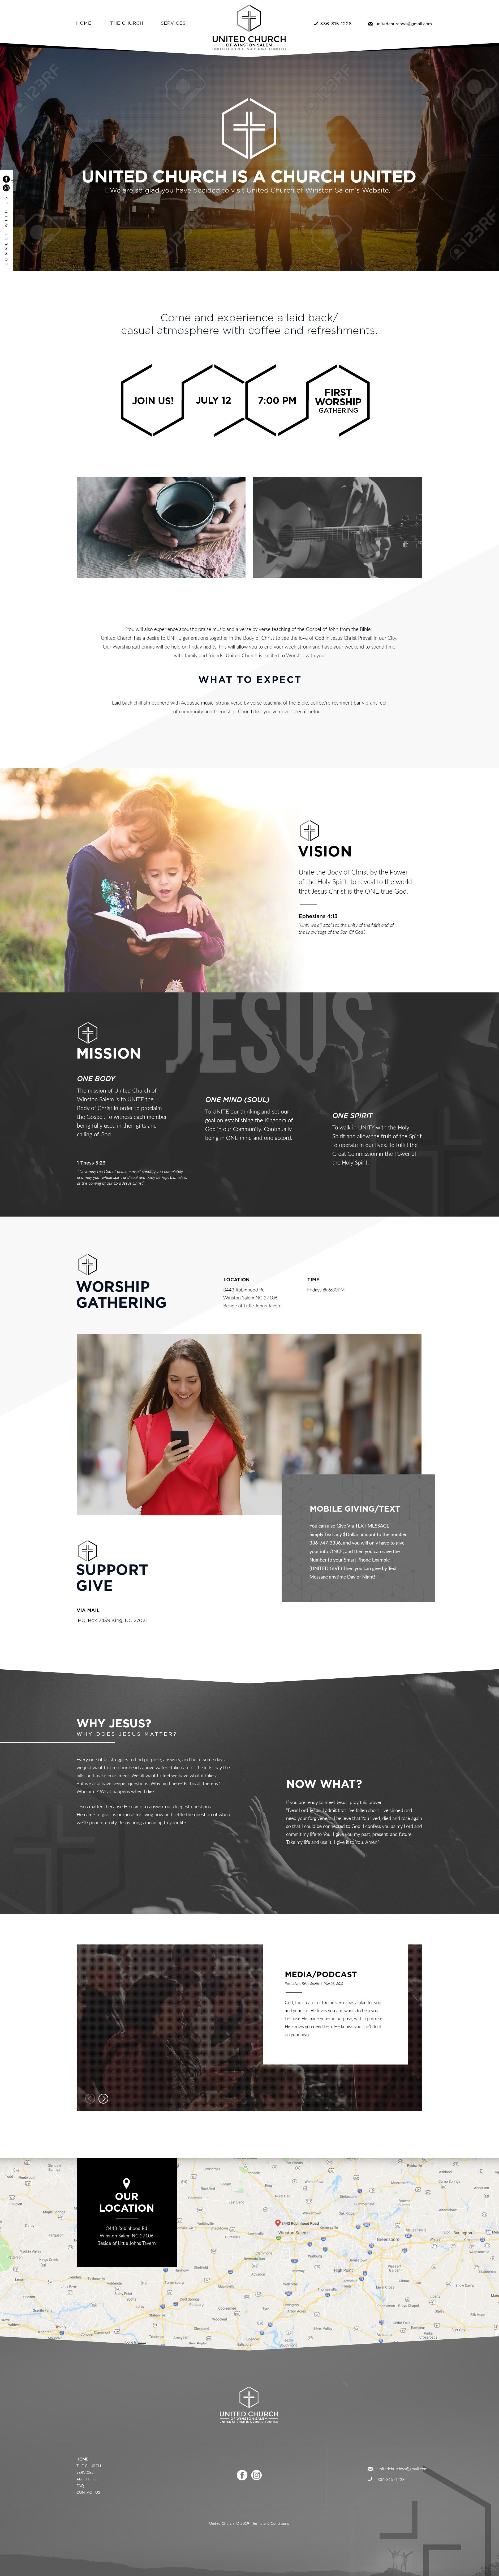 United Church website